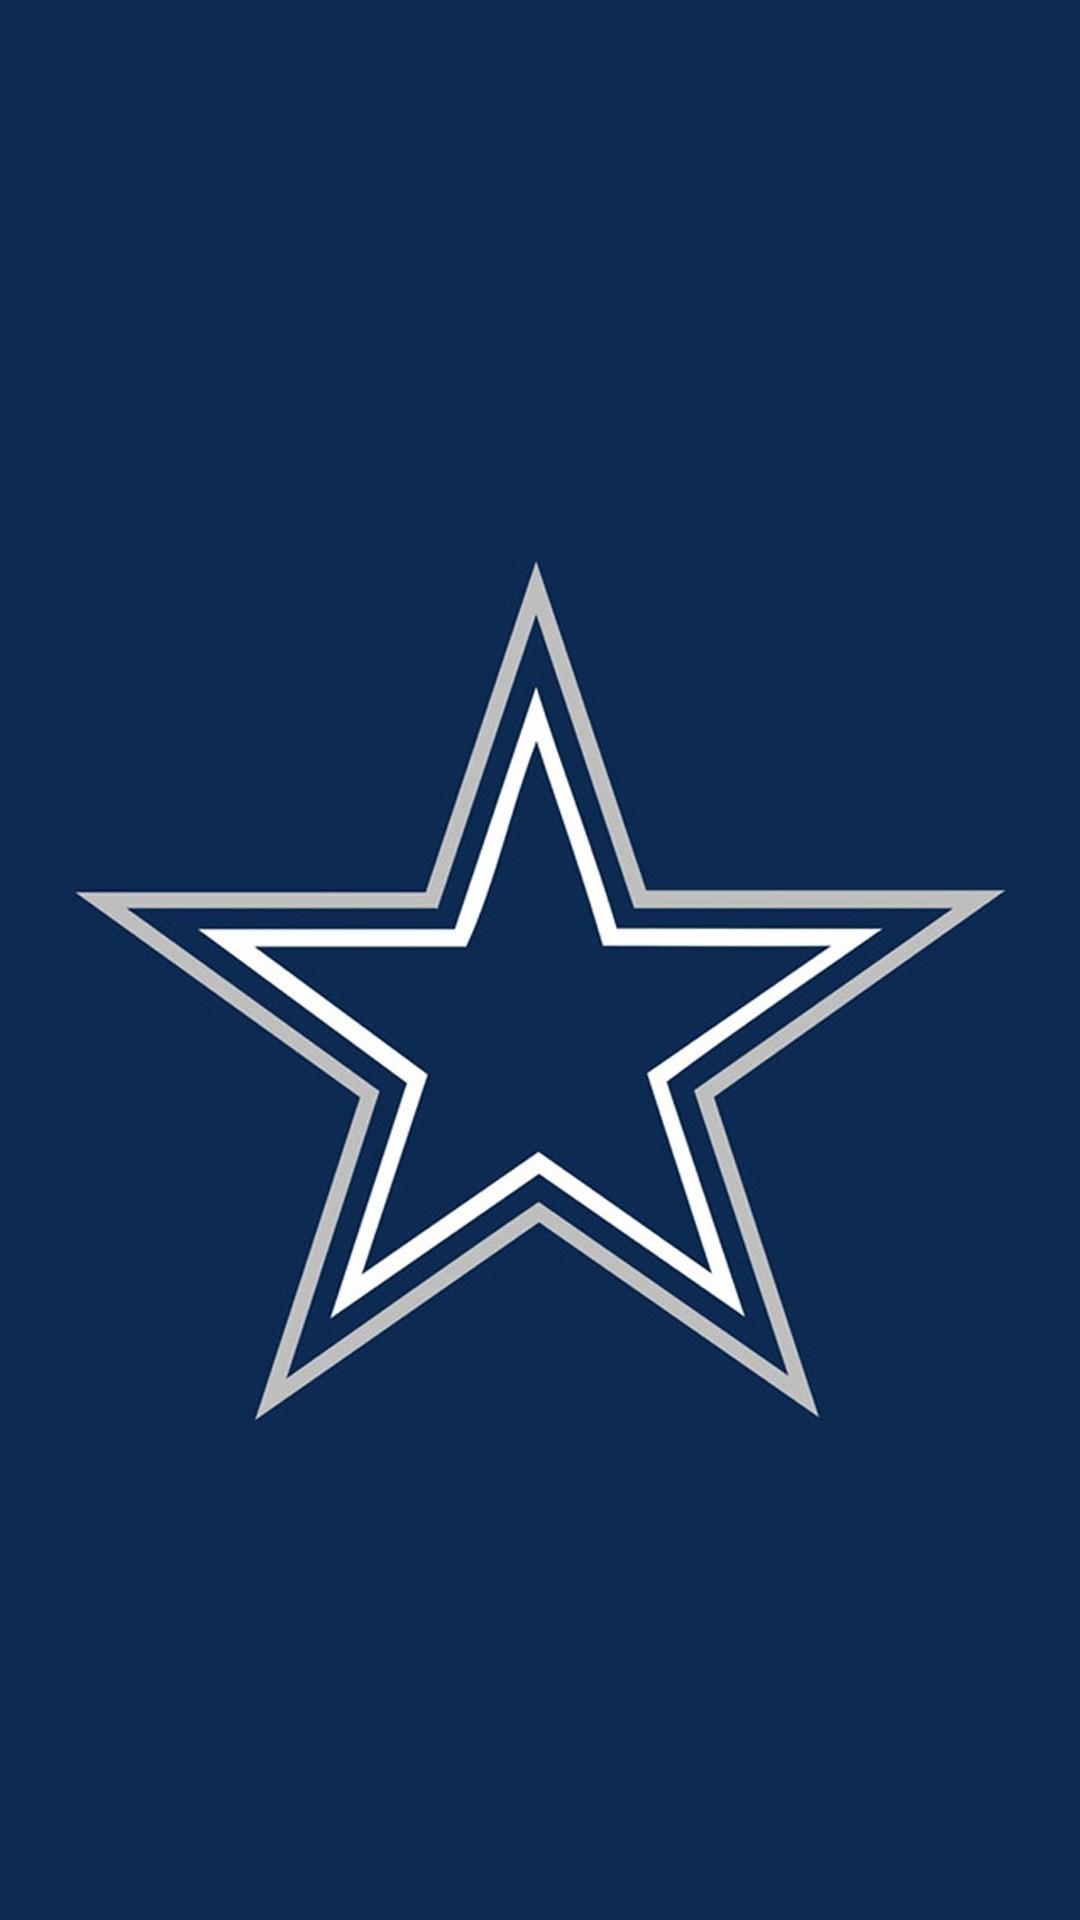 … Dallas Cowboys Iphone Wallpaper Dallas Cowboys Iphone Wallpaper …